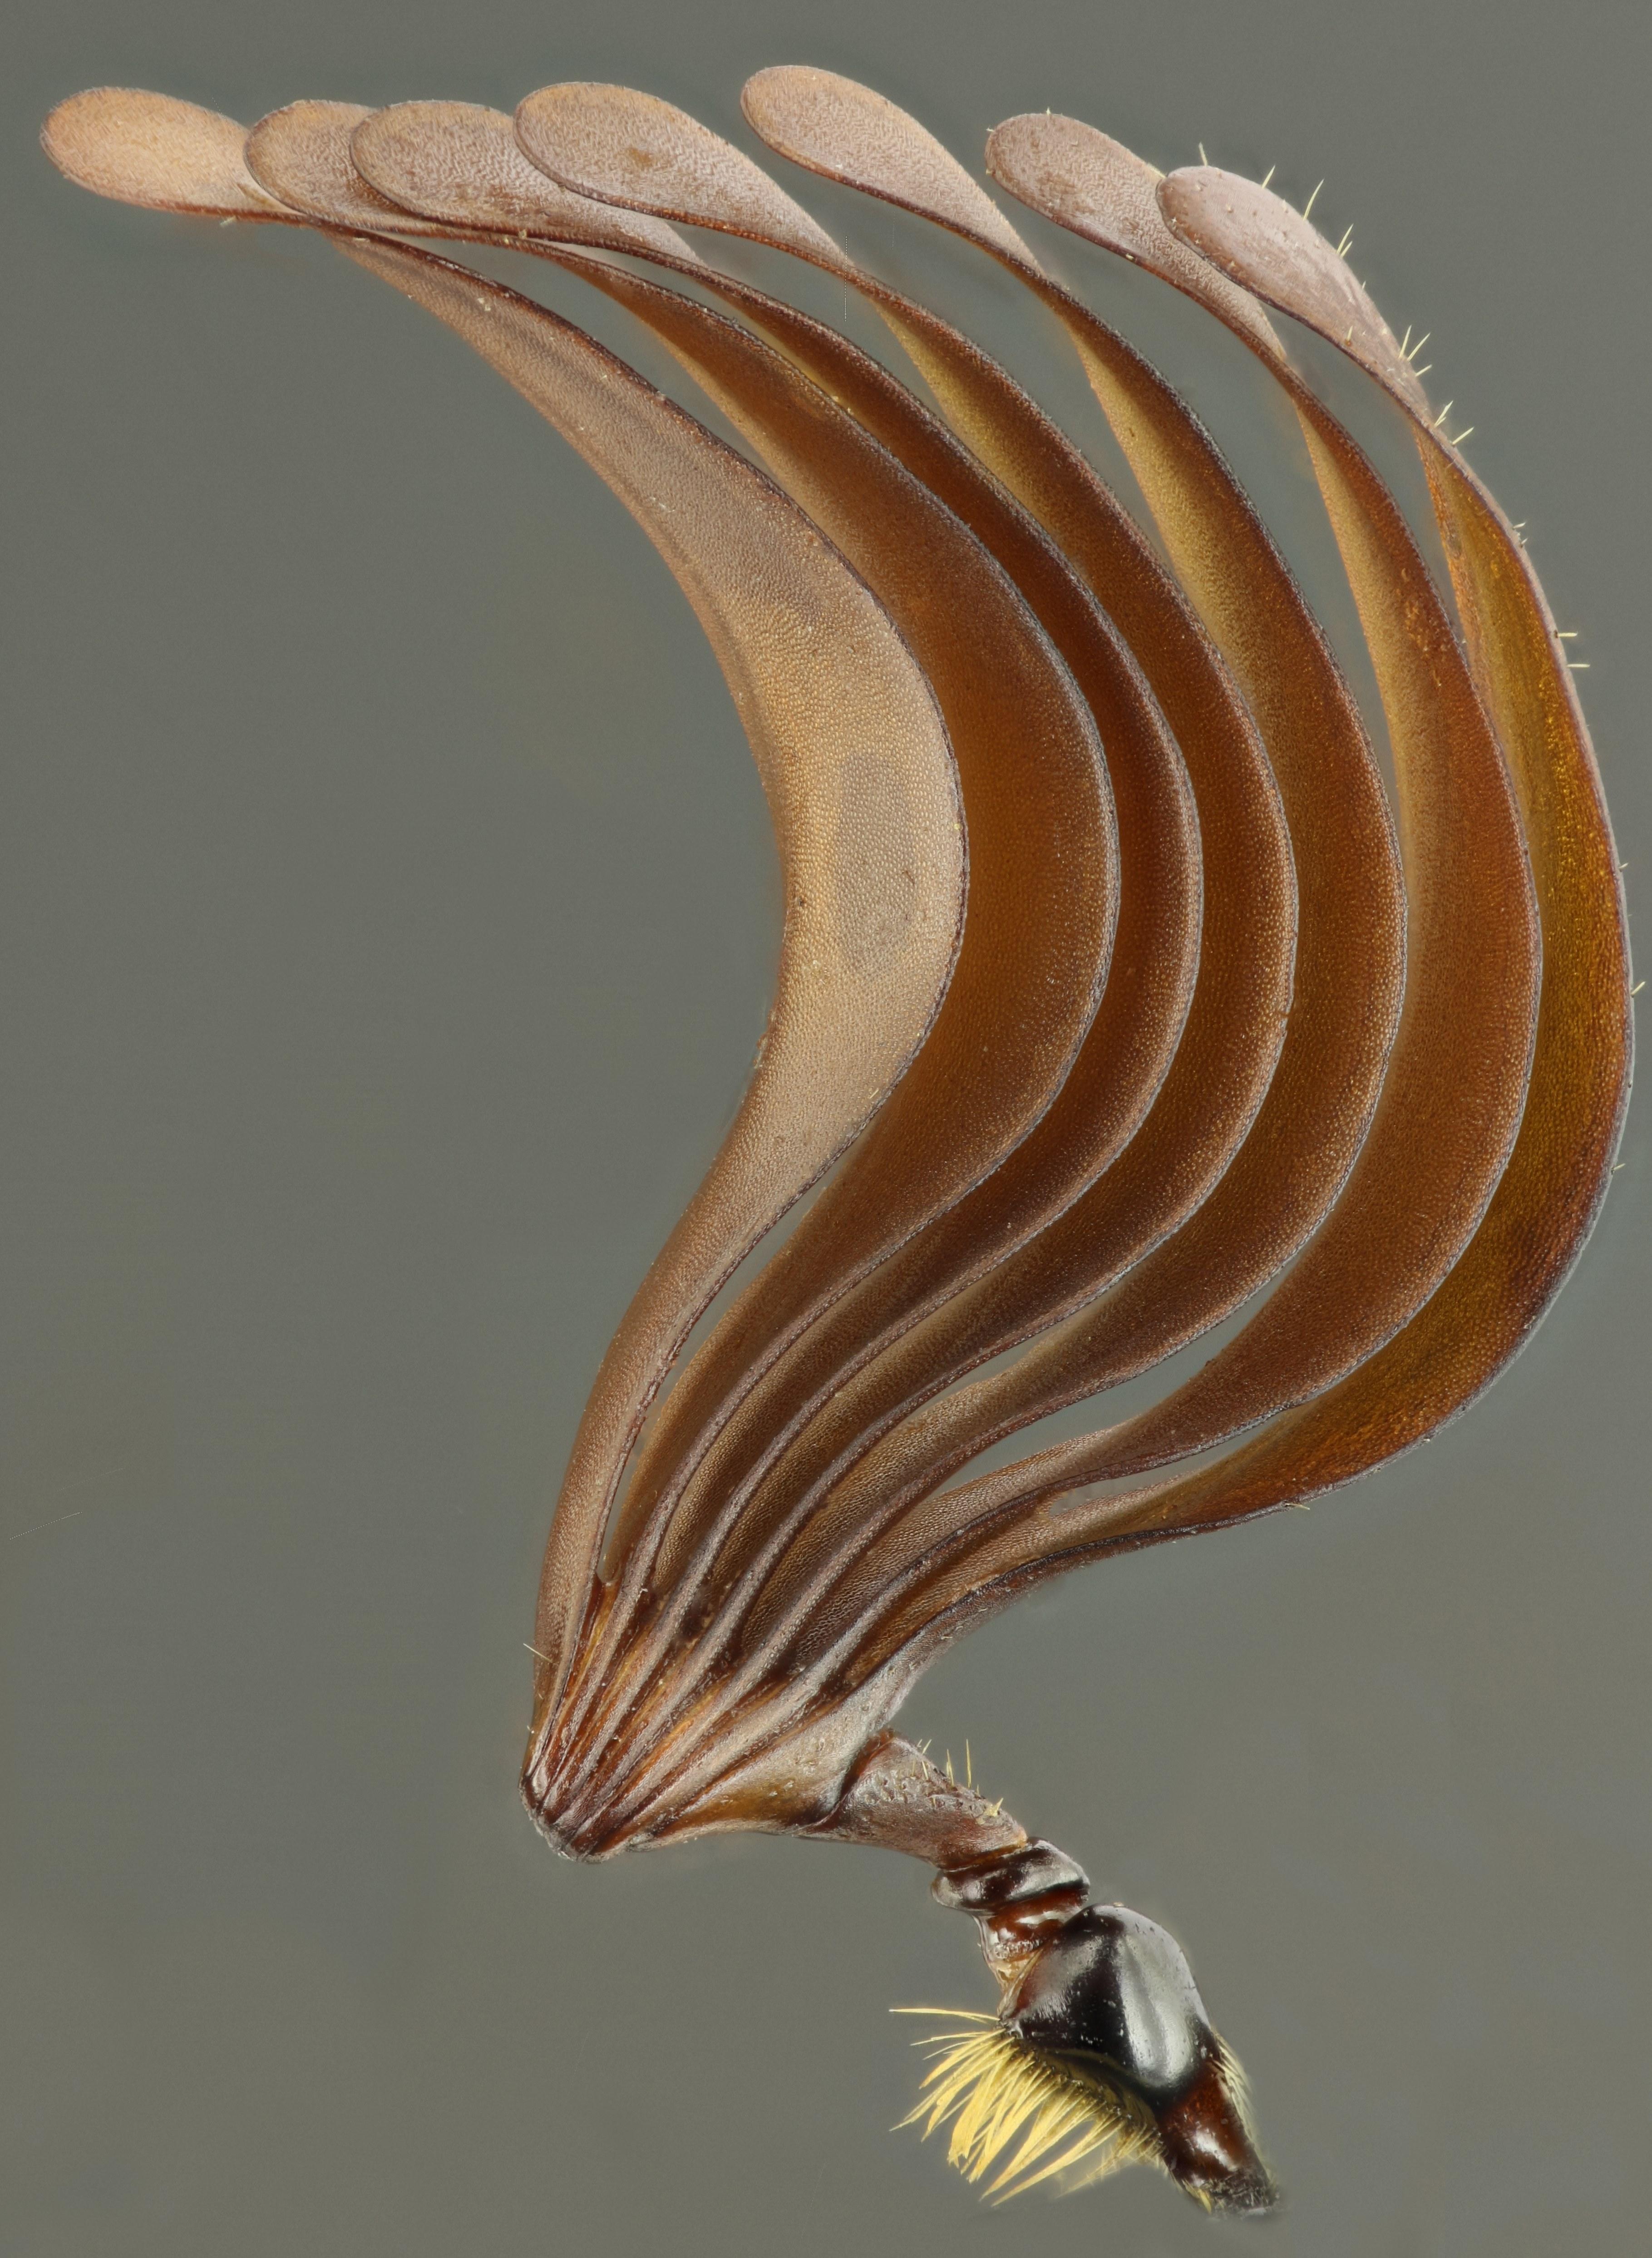 Polyphylla fullo antenne 61216zs52.JPG